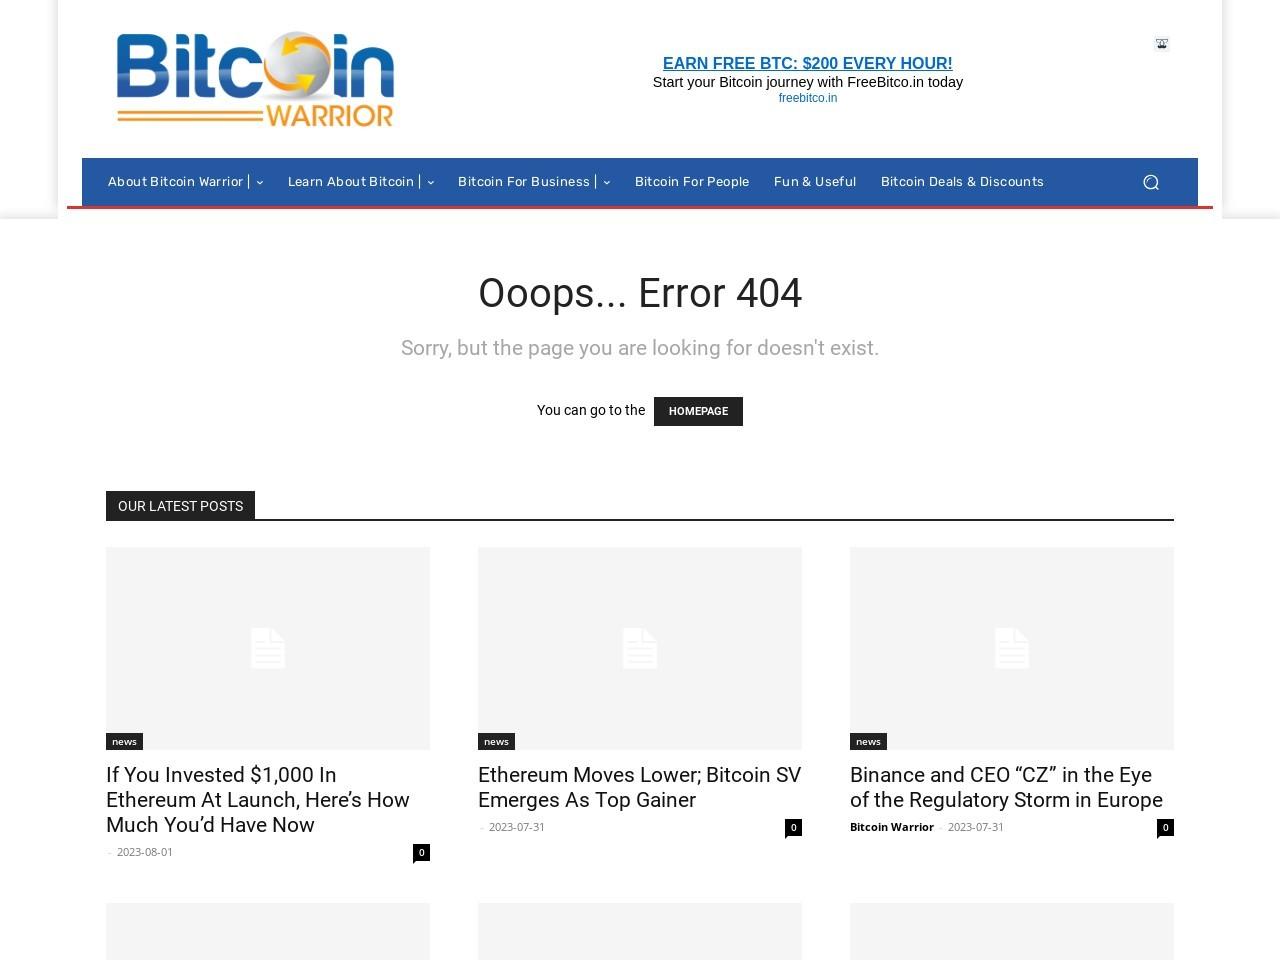 Bitcoin Technical Analysis: BTC/USD Stalls Under $9,300, Volatility Expected As Bitcoin Futures Expire